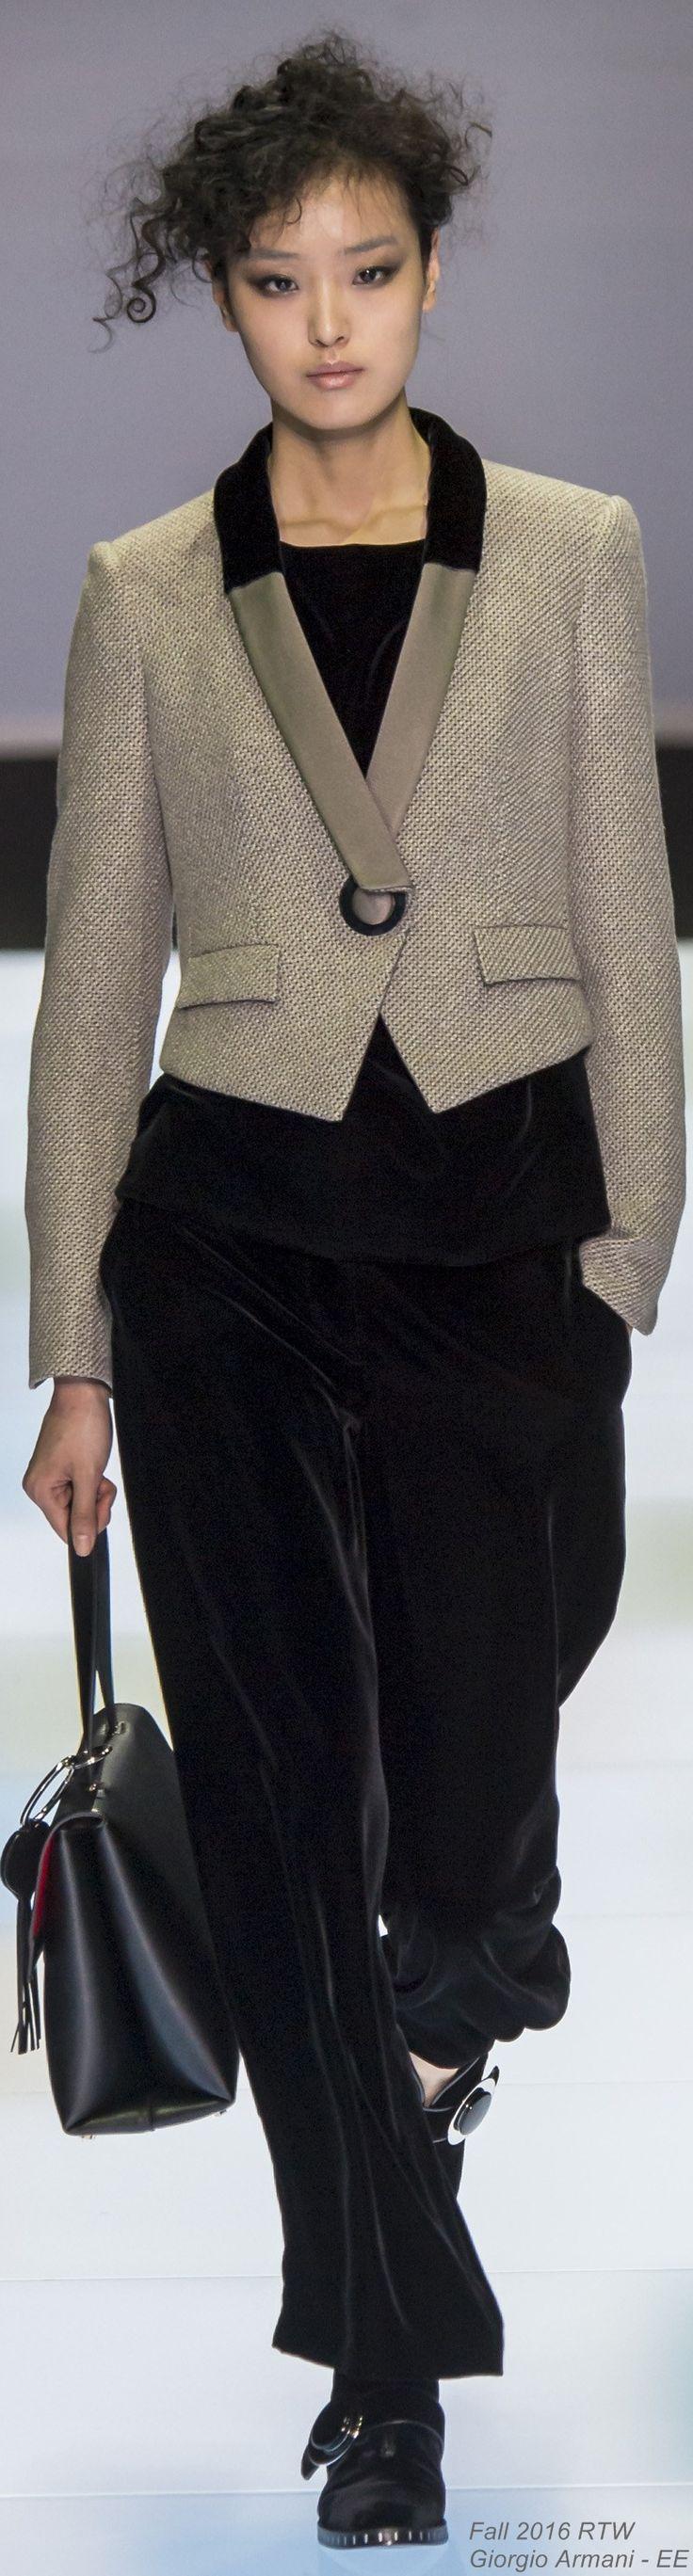 Fall 2016 Ready-to-Wear Giorgio Armani